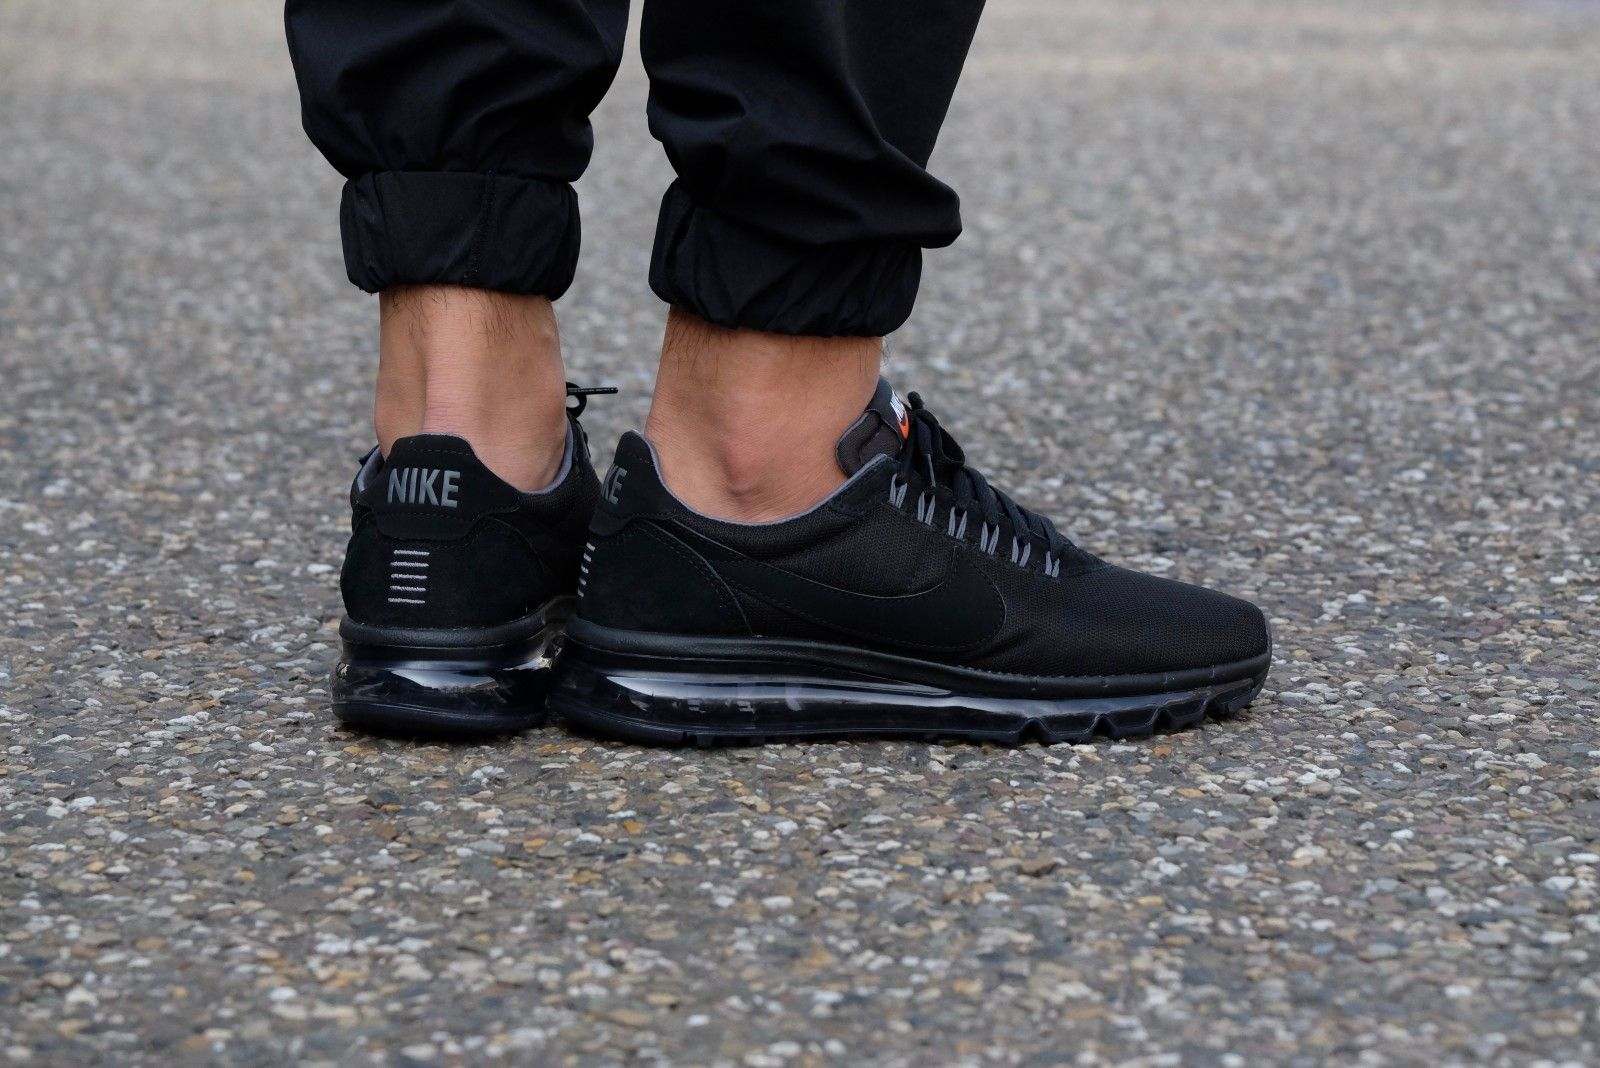 Nike Air Max LD-Zero Black/Black-Dark Grey - 848624-005